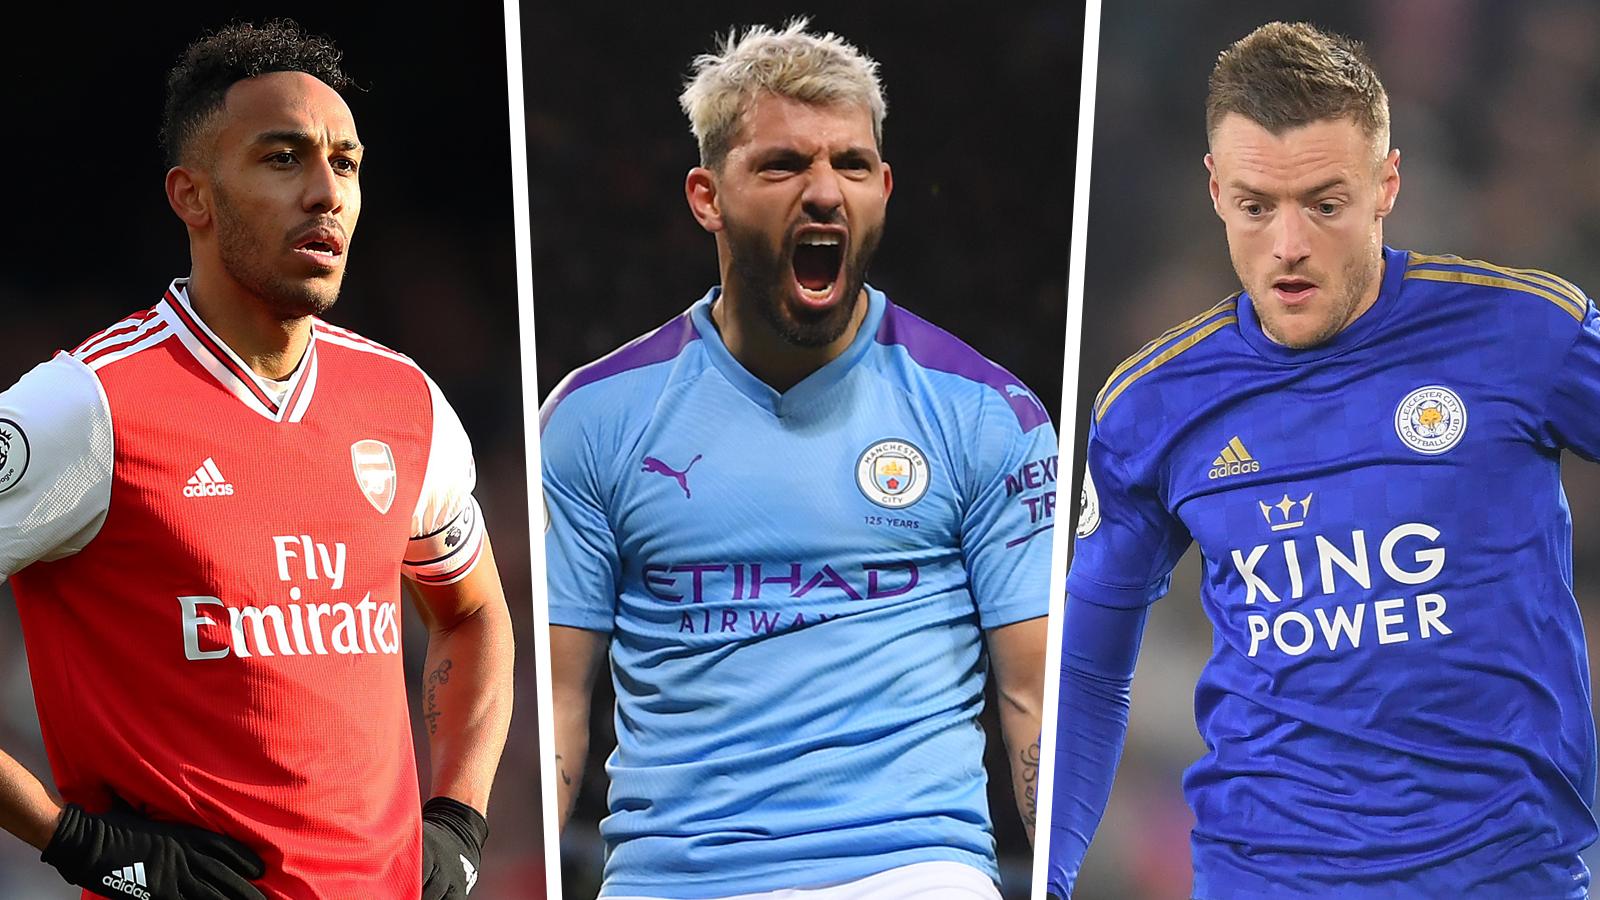 Top goal scorers premier league betting site bet on eurovision 2019